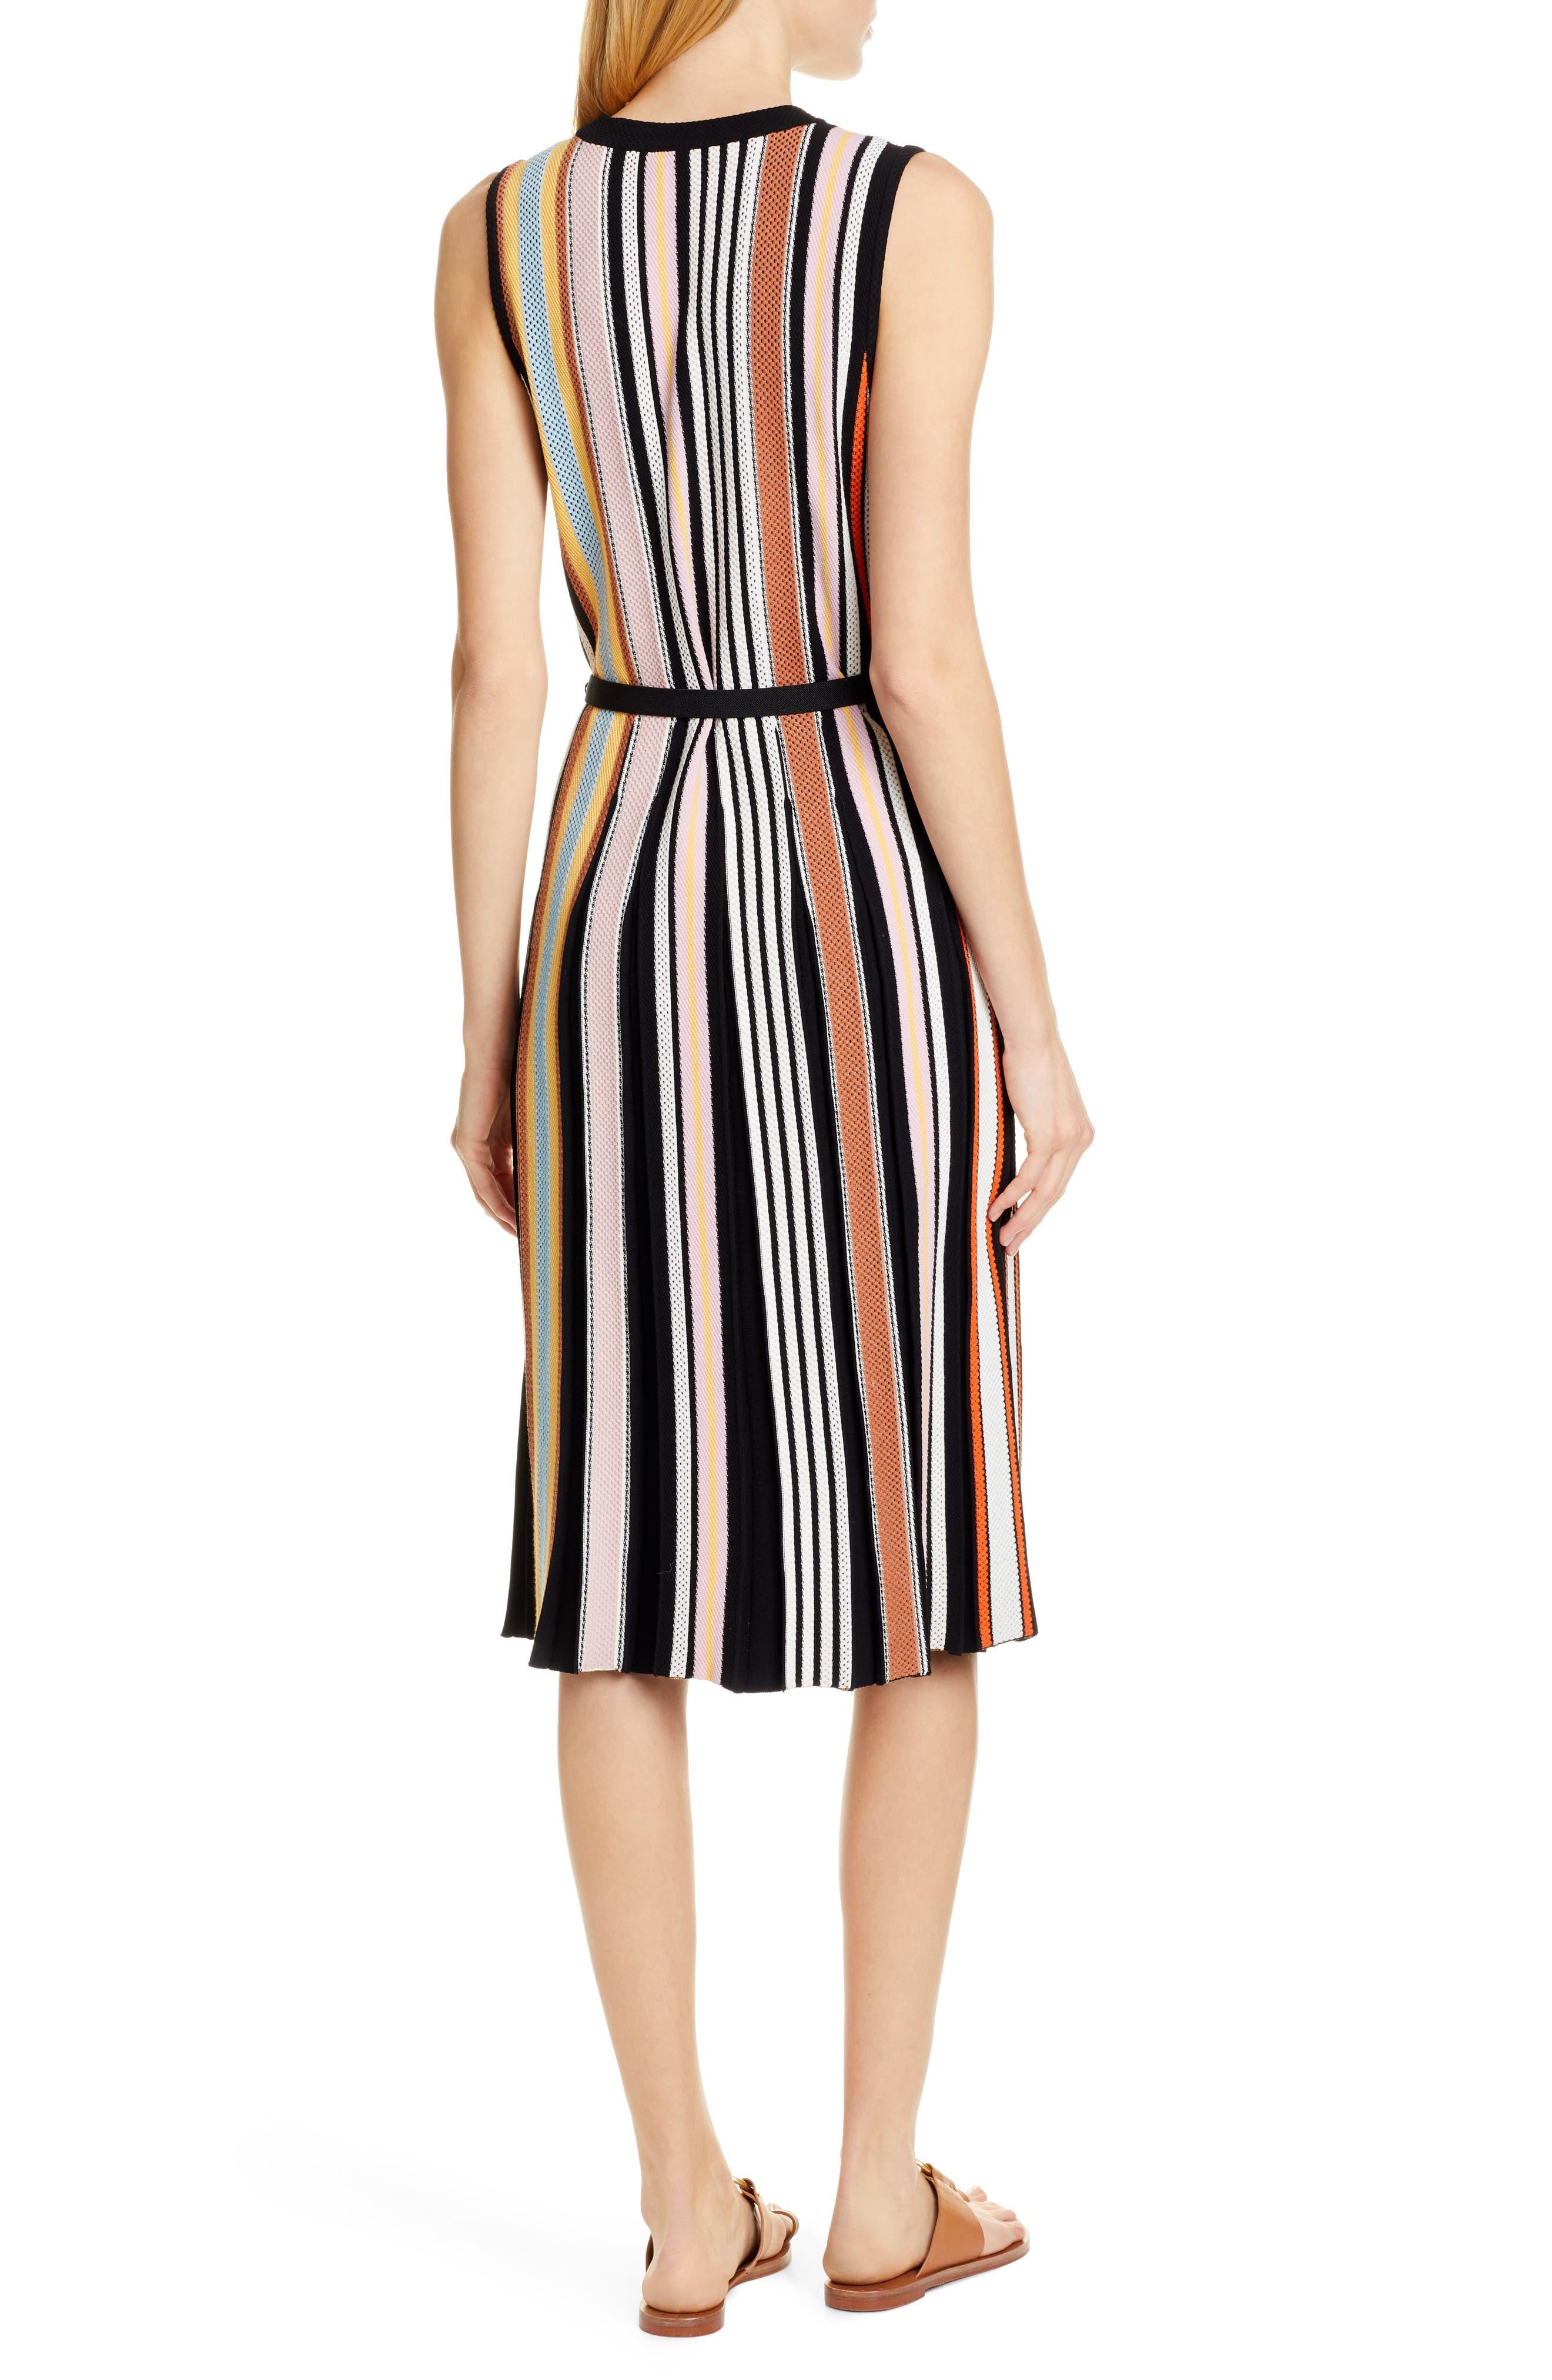 TORY BURCH, Stripe Sweater Dress, Alternate thumbnail 2, color, WEBBING STRIPE